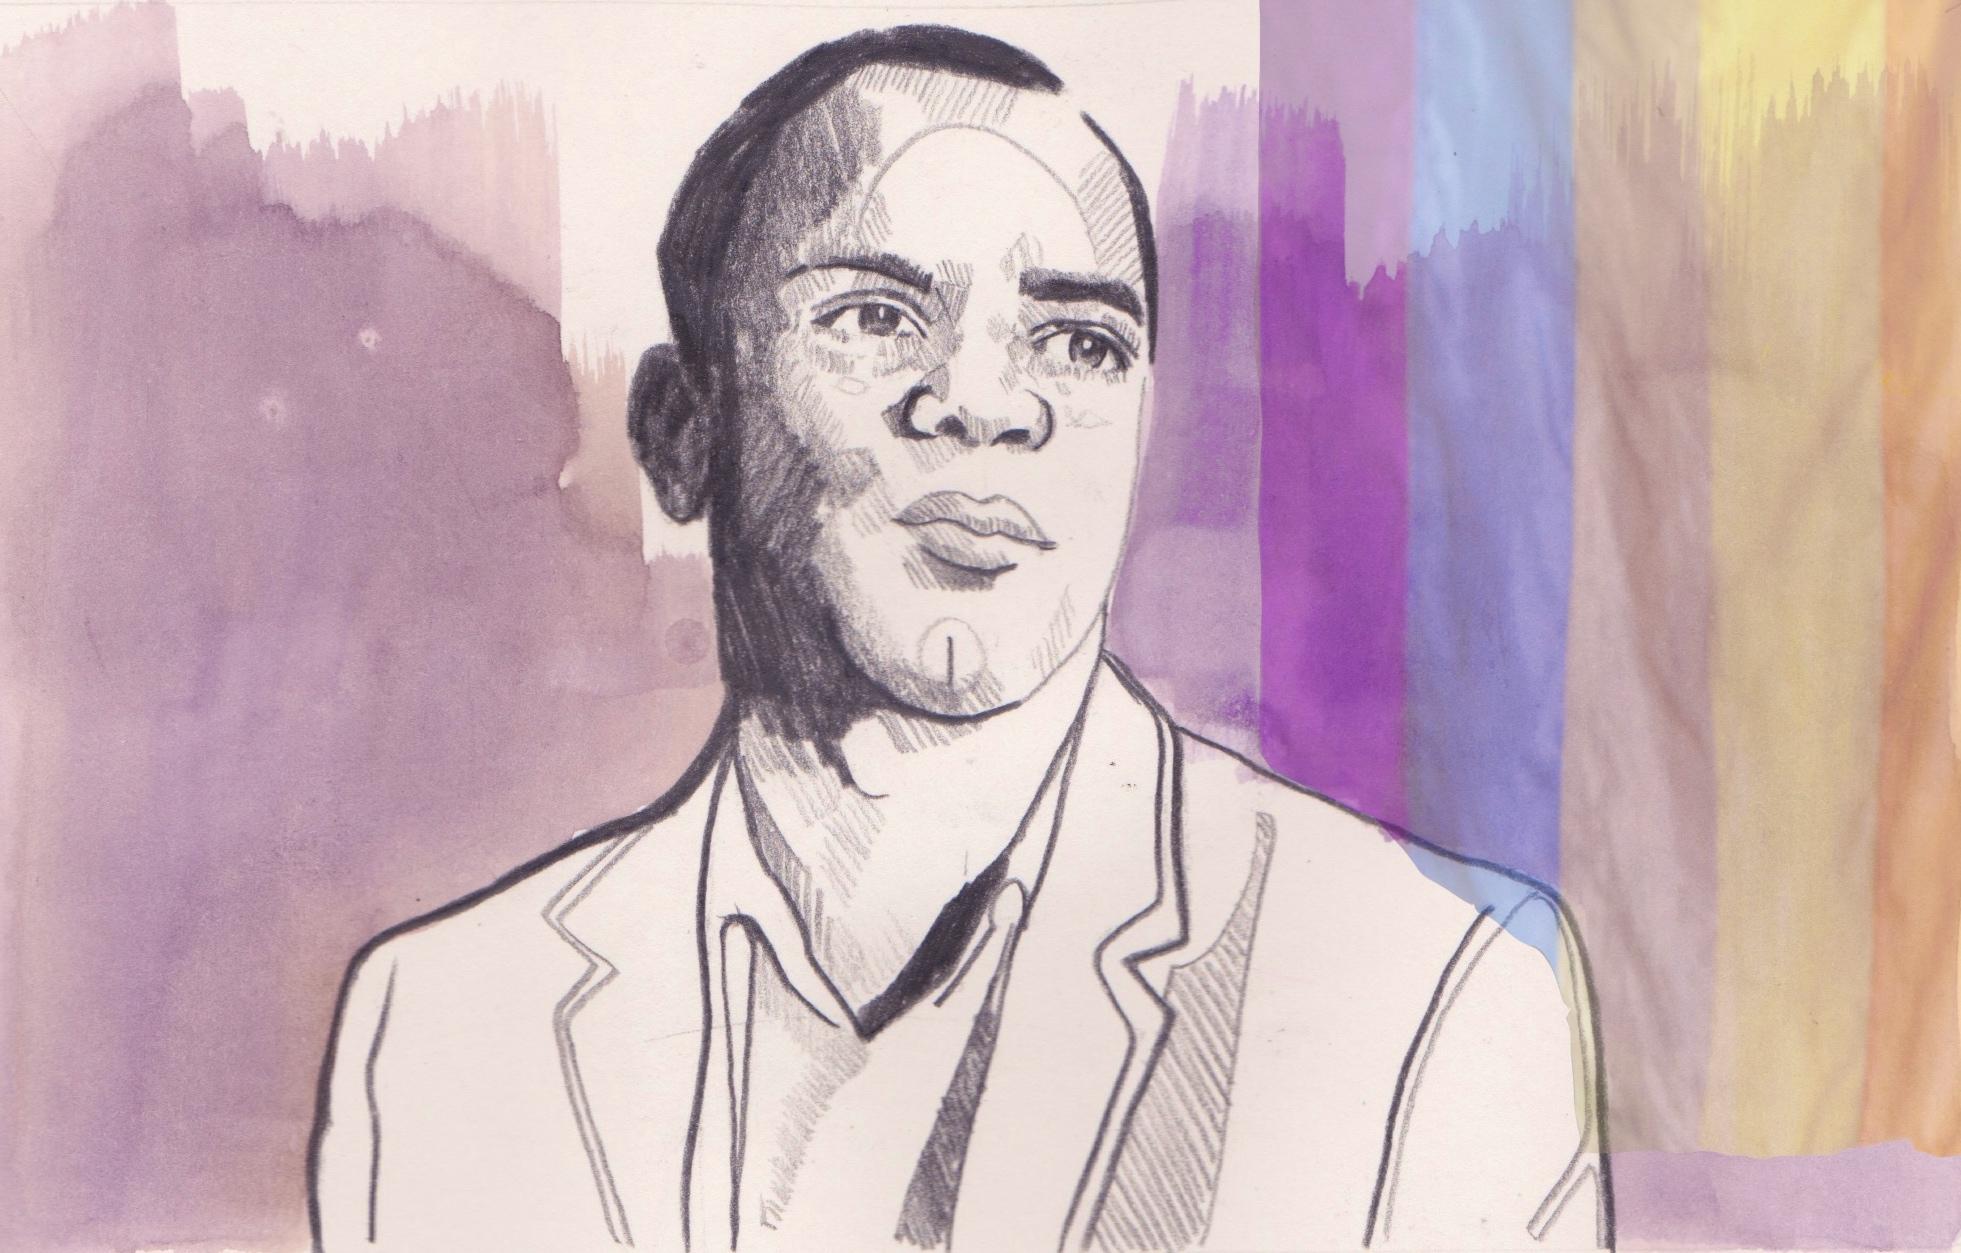 05/03/15Frank Mugisha, an outspoken activist on gay rights in Uganda